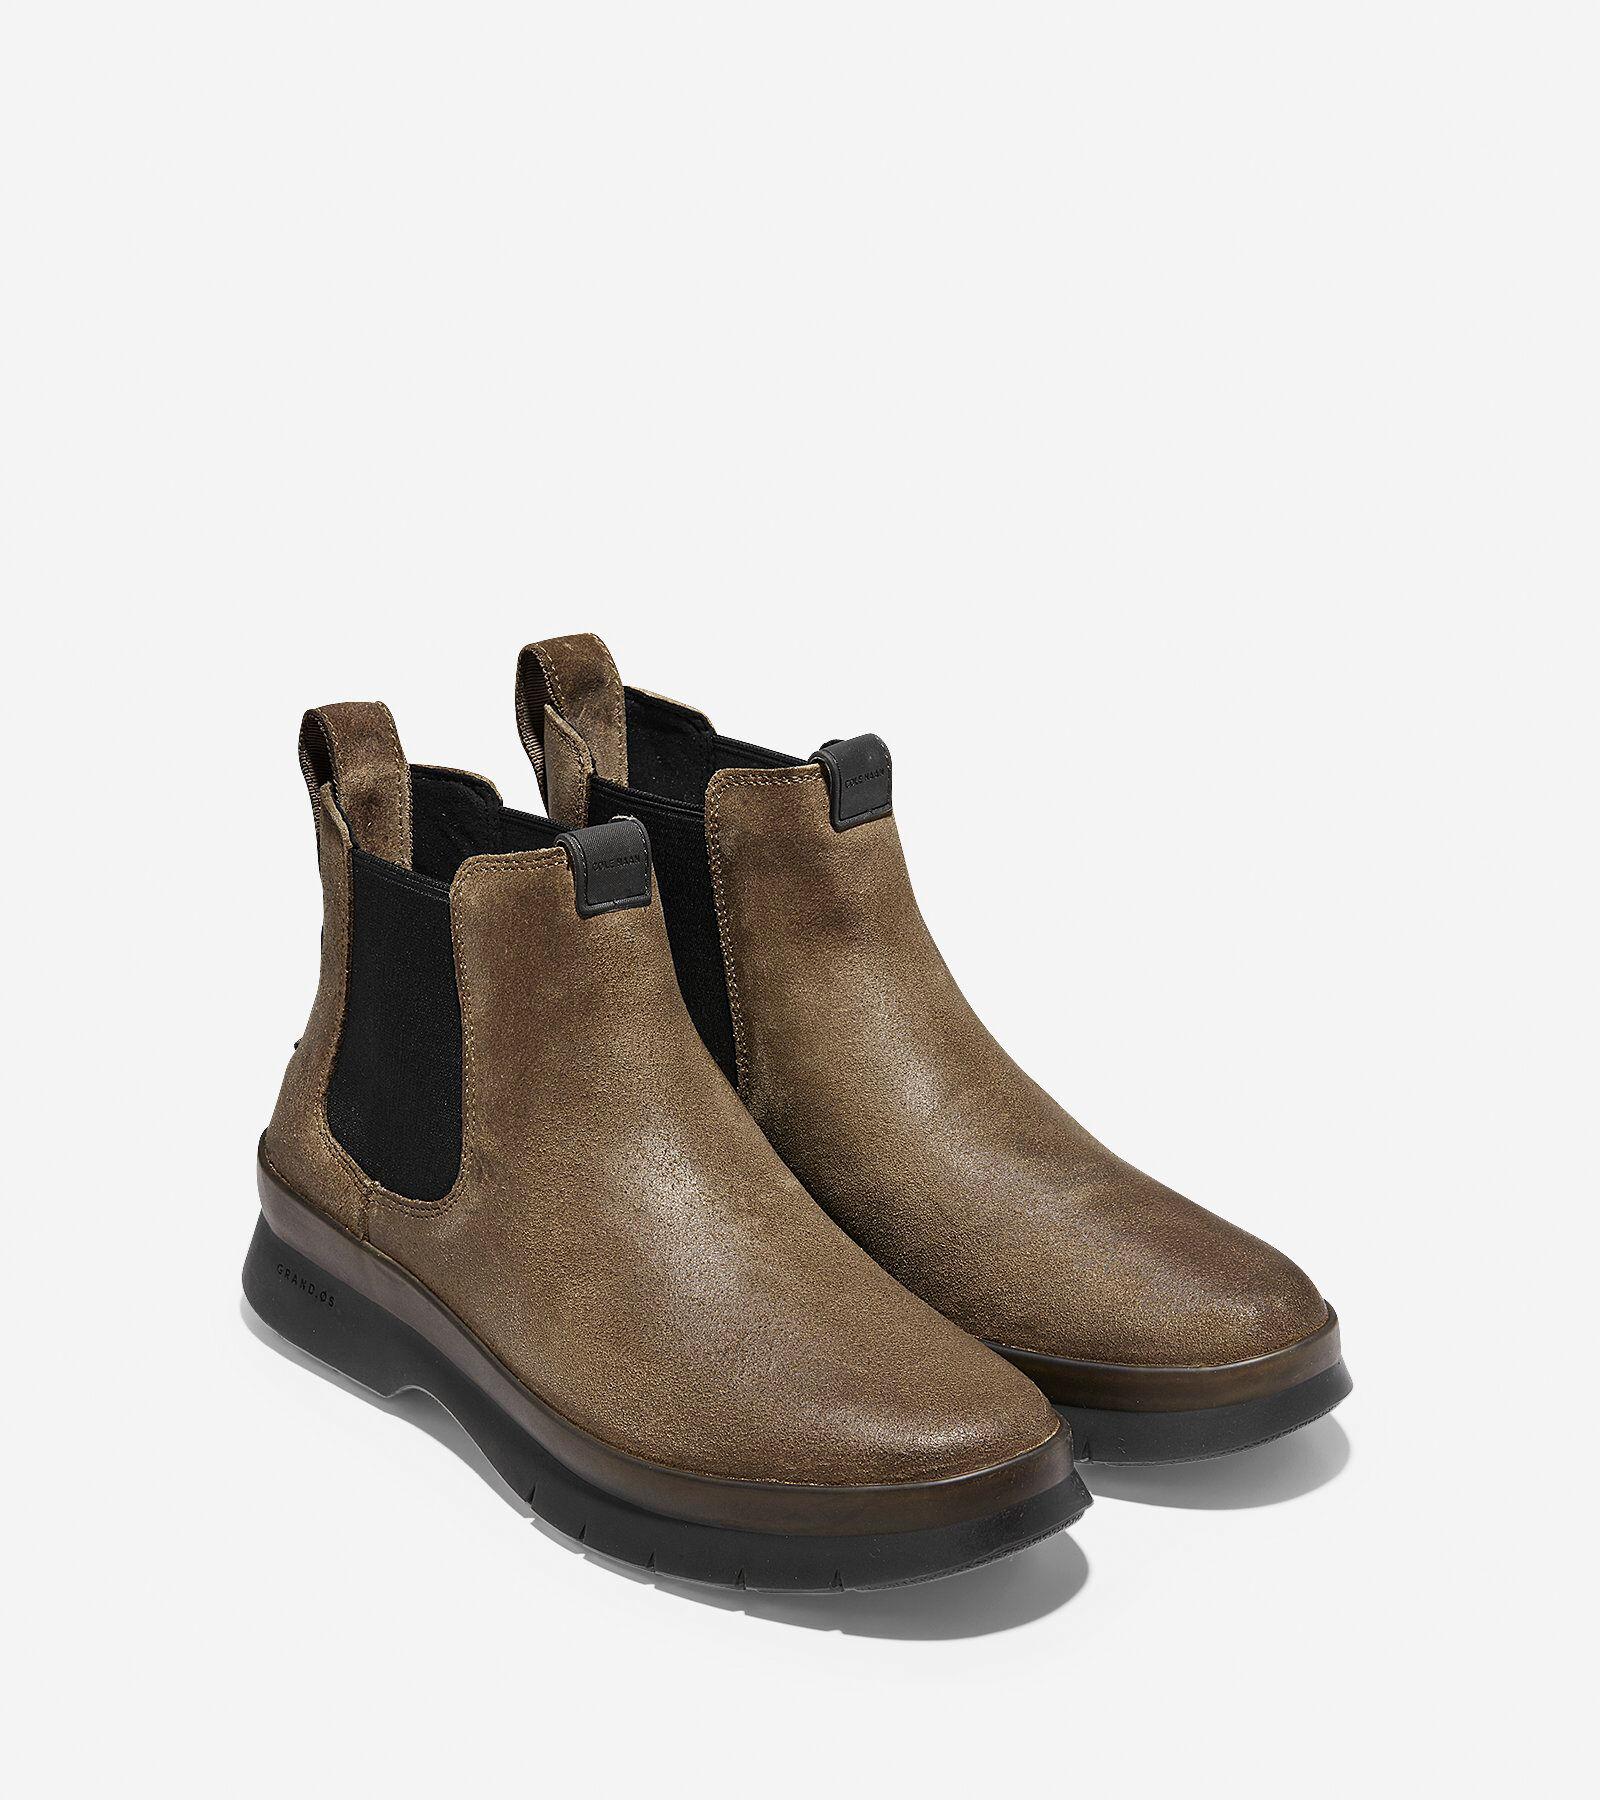 Men's Pinch Utility Chelsea Boot in